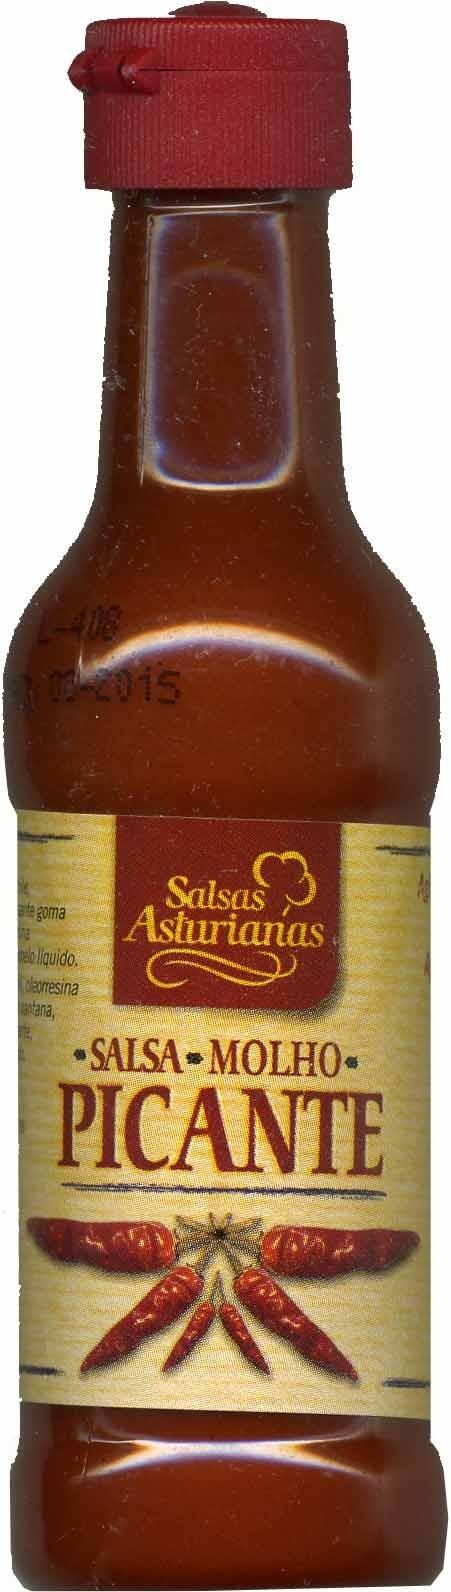 Salsa de chiles picantes - Producto